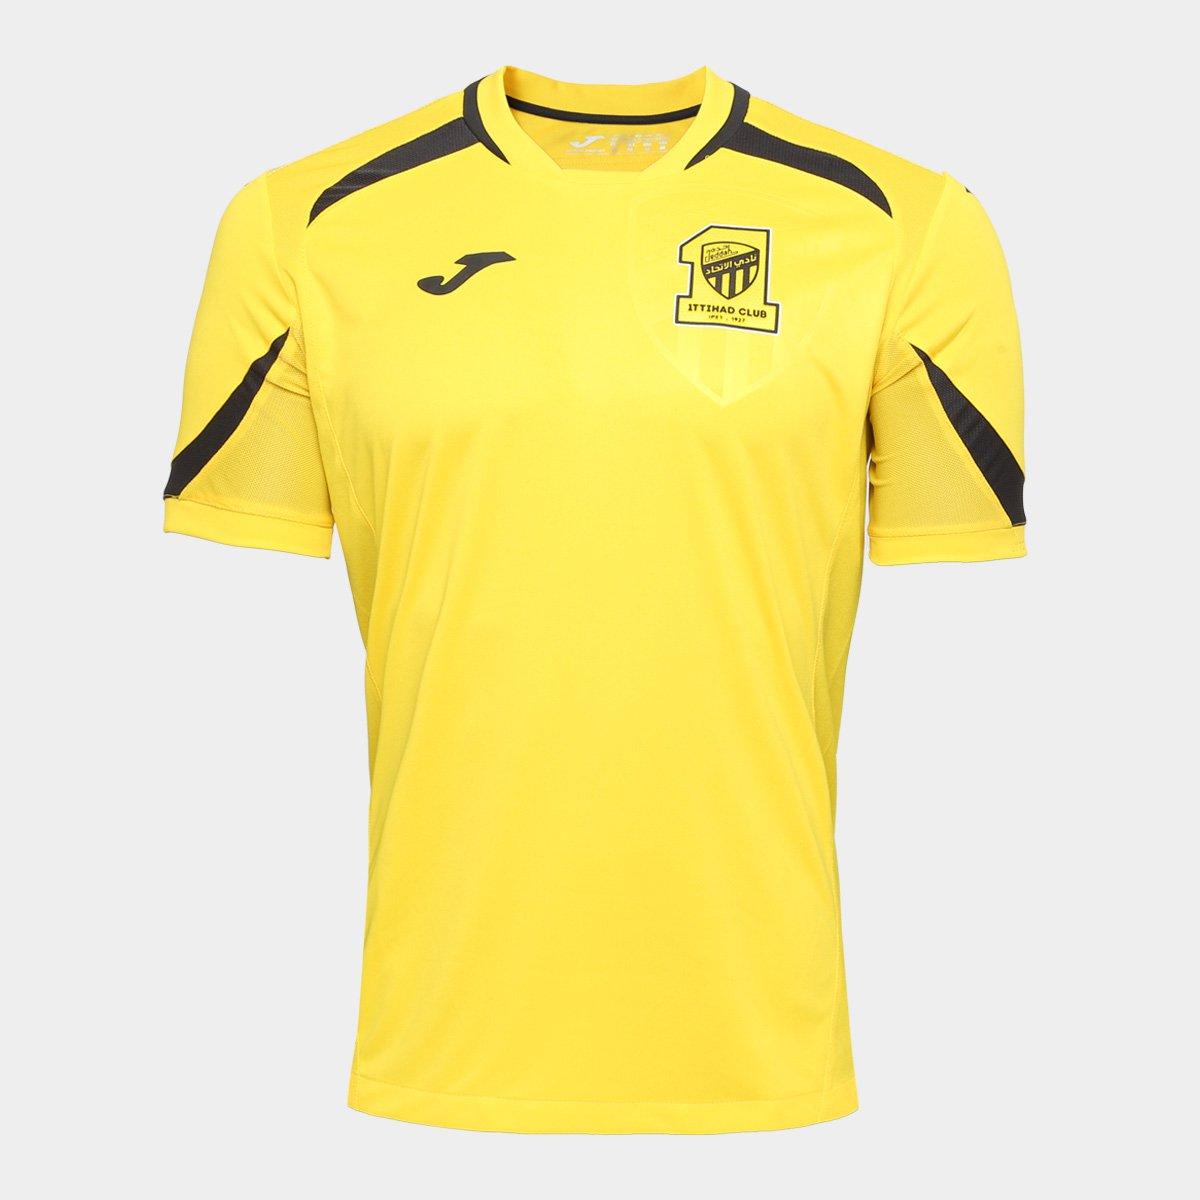 5abfd5cae5 Camisa Ittihad Third 17 18 s n°- Torcedor Joma Masculina